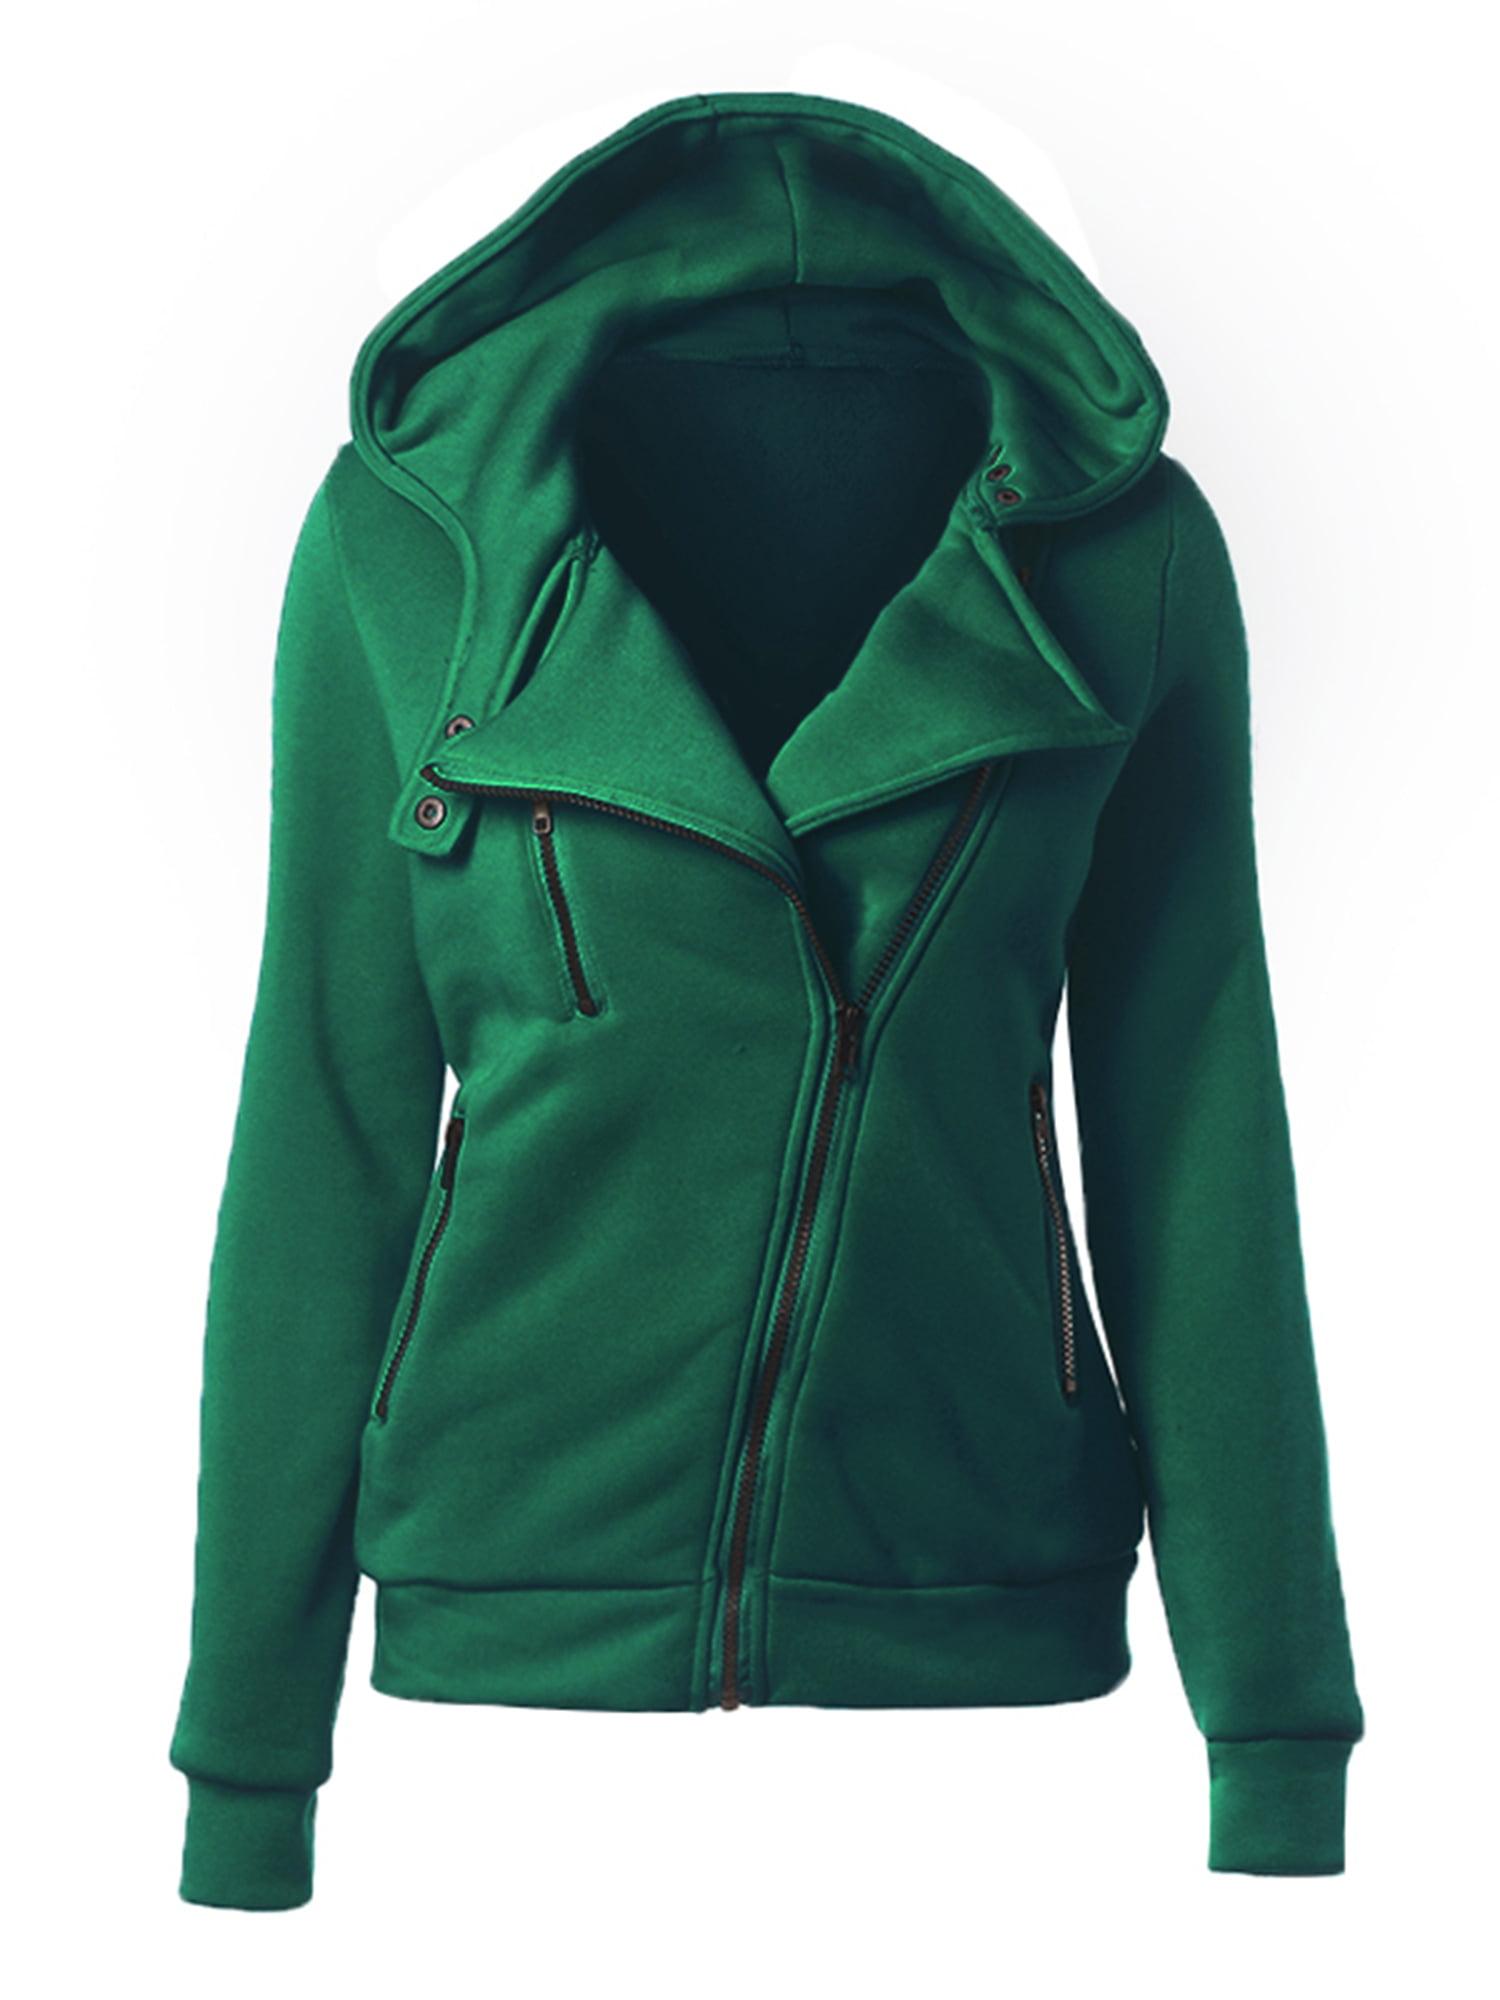 CHQTG Long Sleeve Hoodie Print Cute Christmas Pudding Great Jacket Zipper Coat Fashion Mens Sweatshirt Full-Zip S-3xl